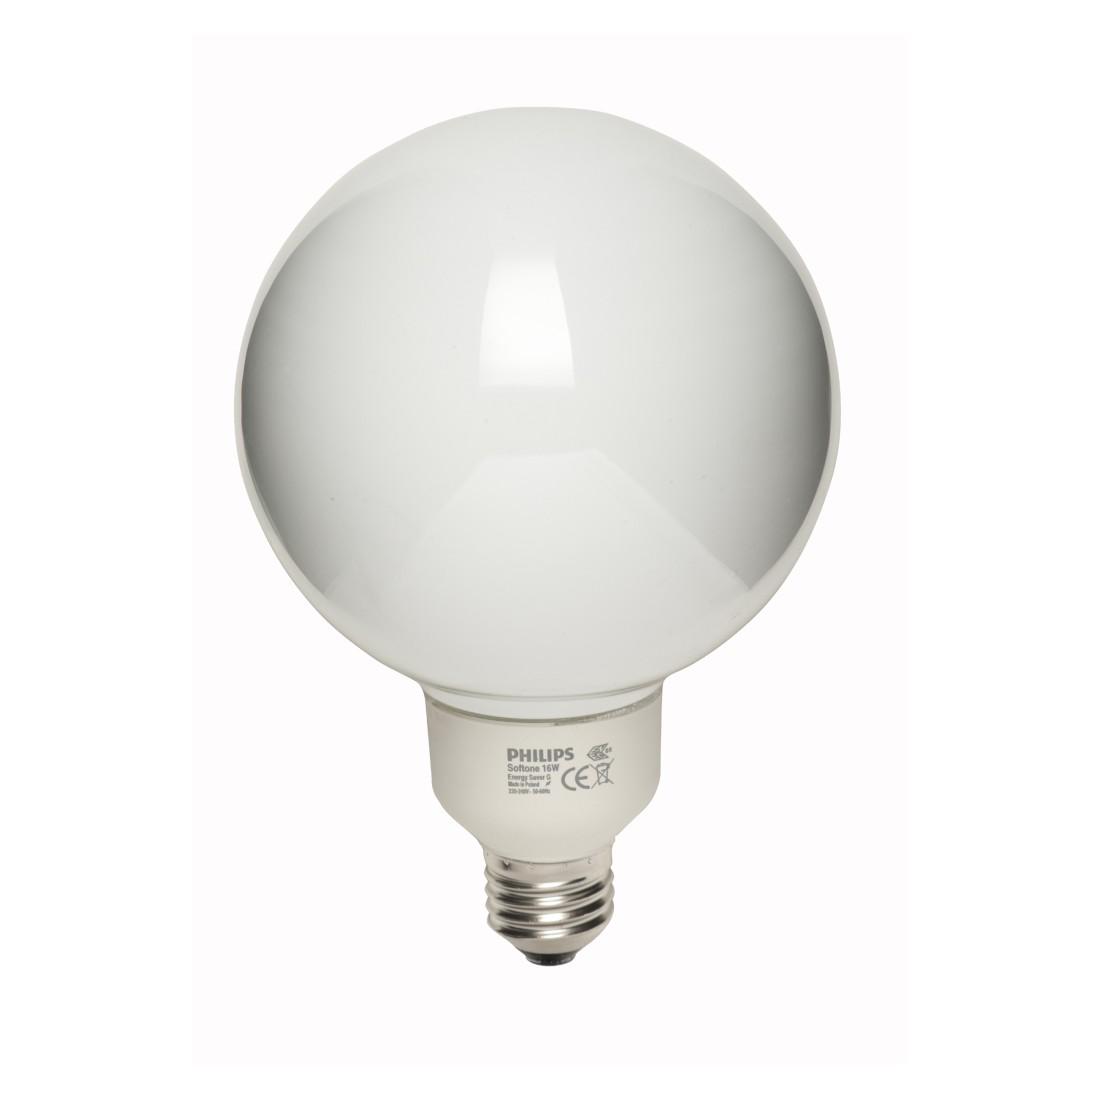 Energiesparlampe E27 16 W Globe G120 ● Glas Opalweiß- Mega Licht